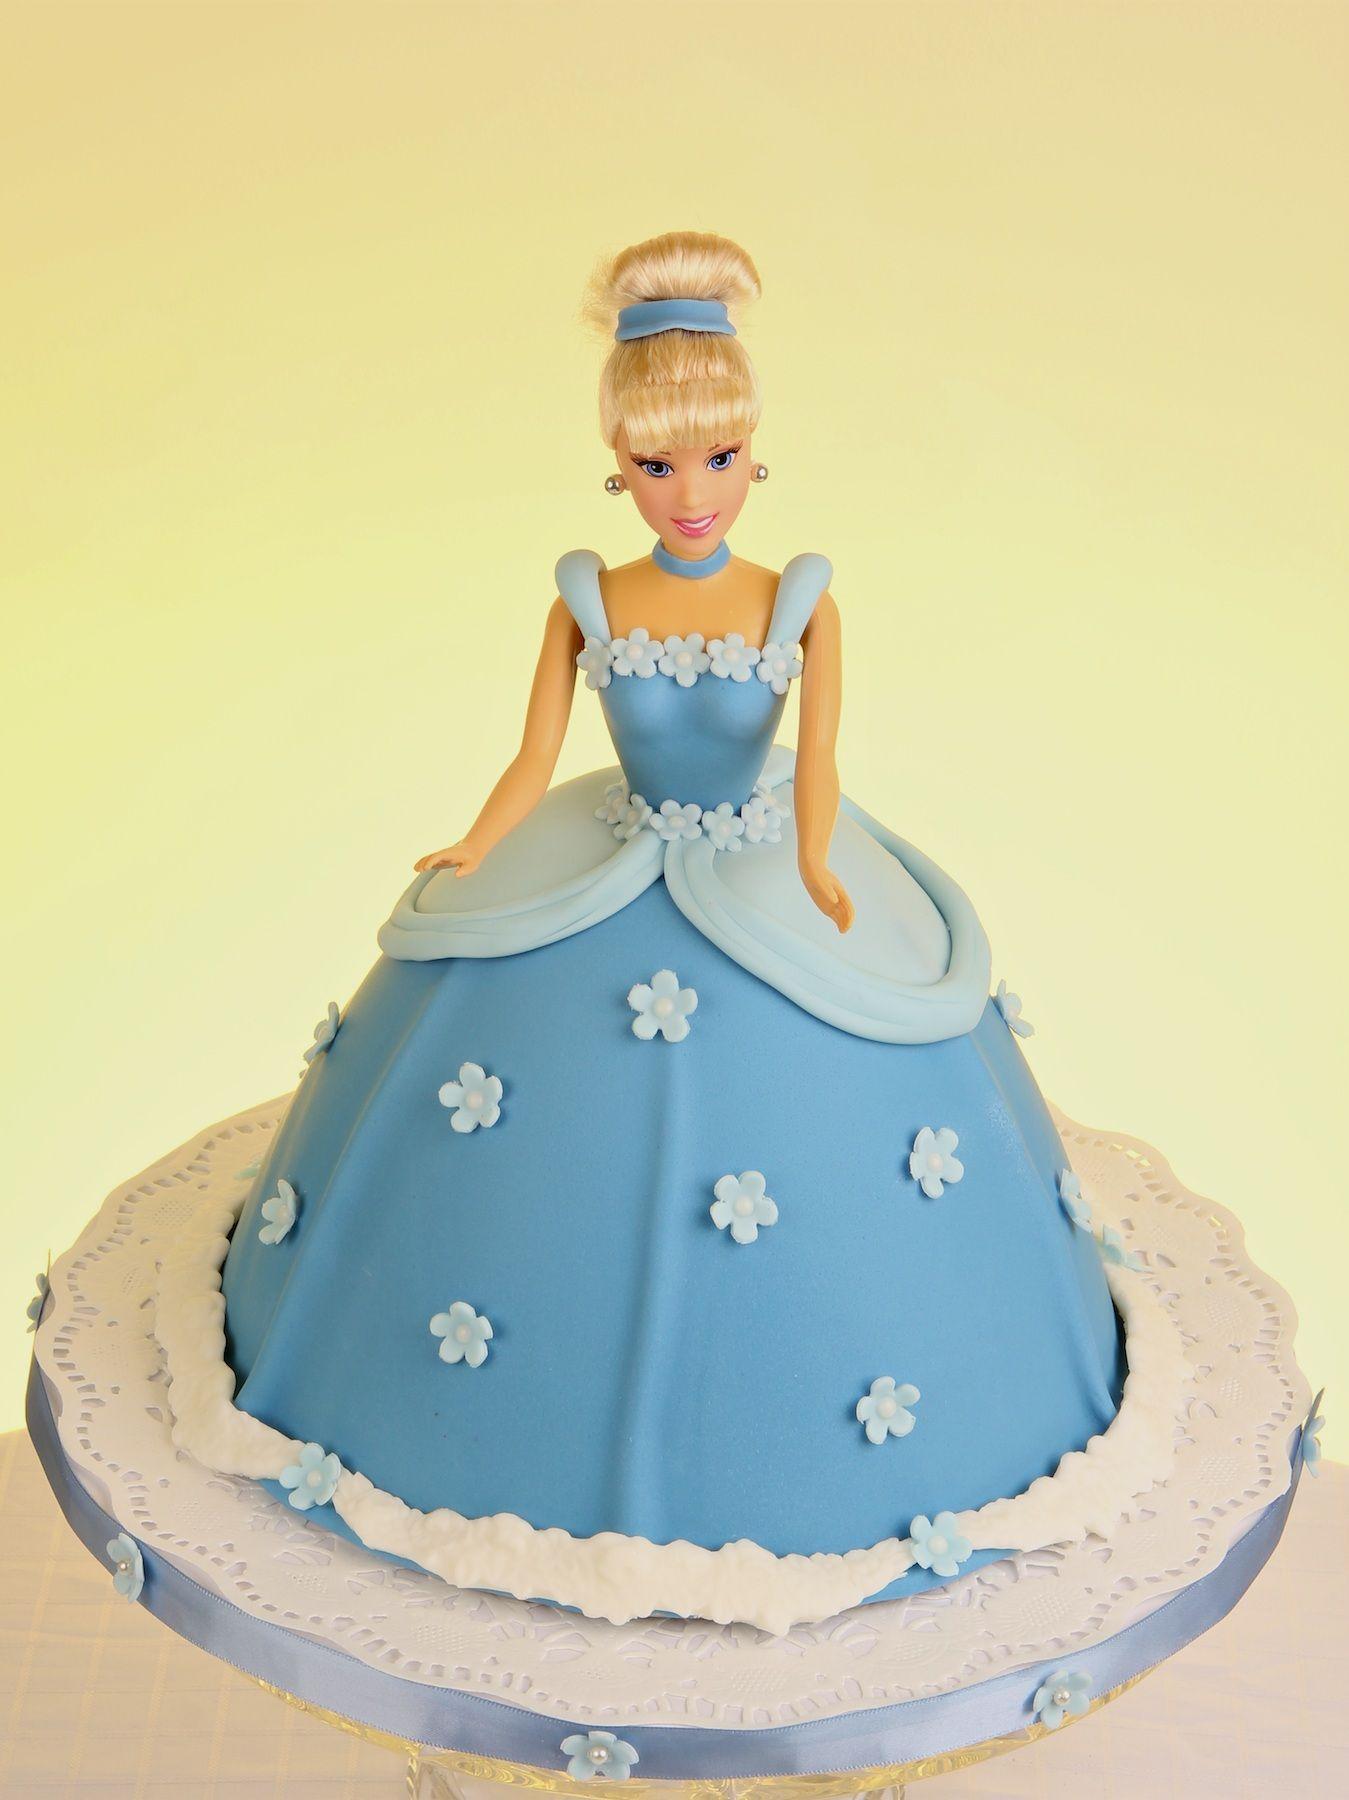 Cake Design Cinderella : Cinderella Cake Cakes Pinterest